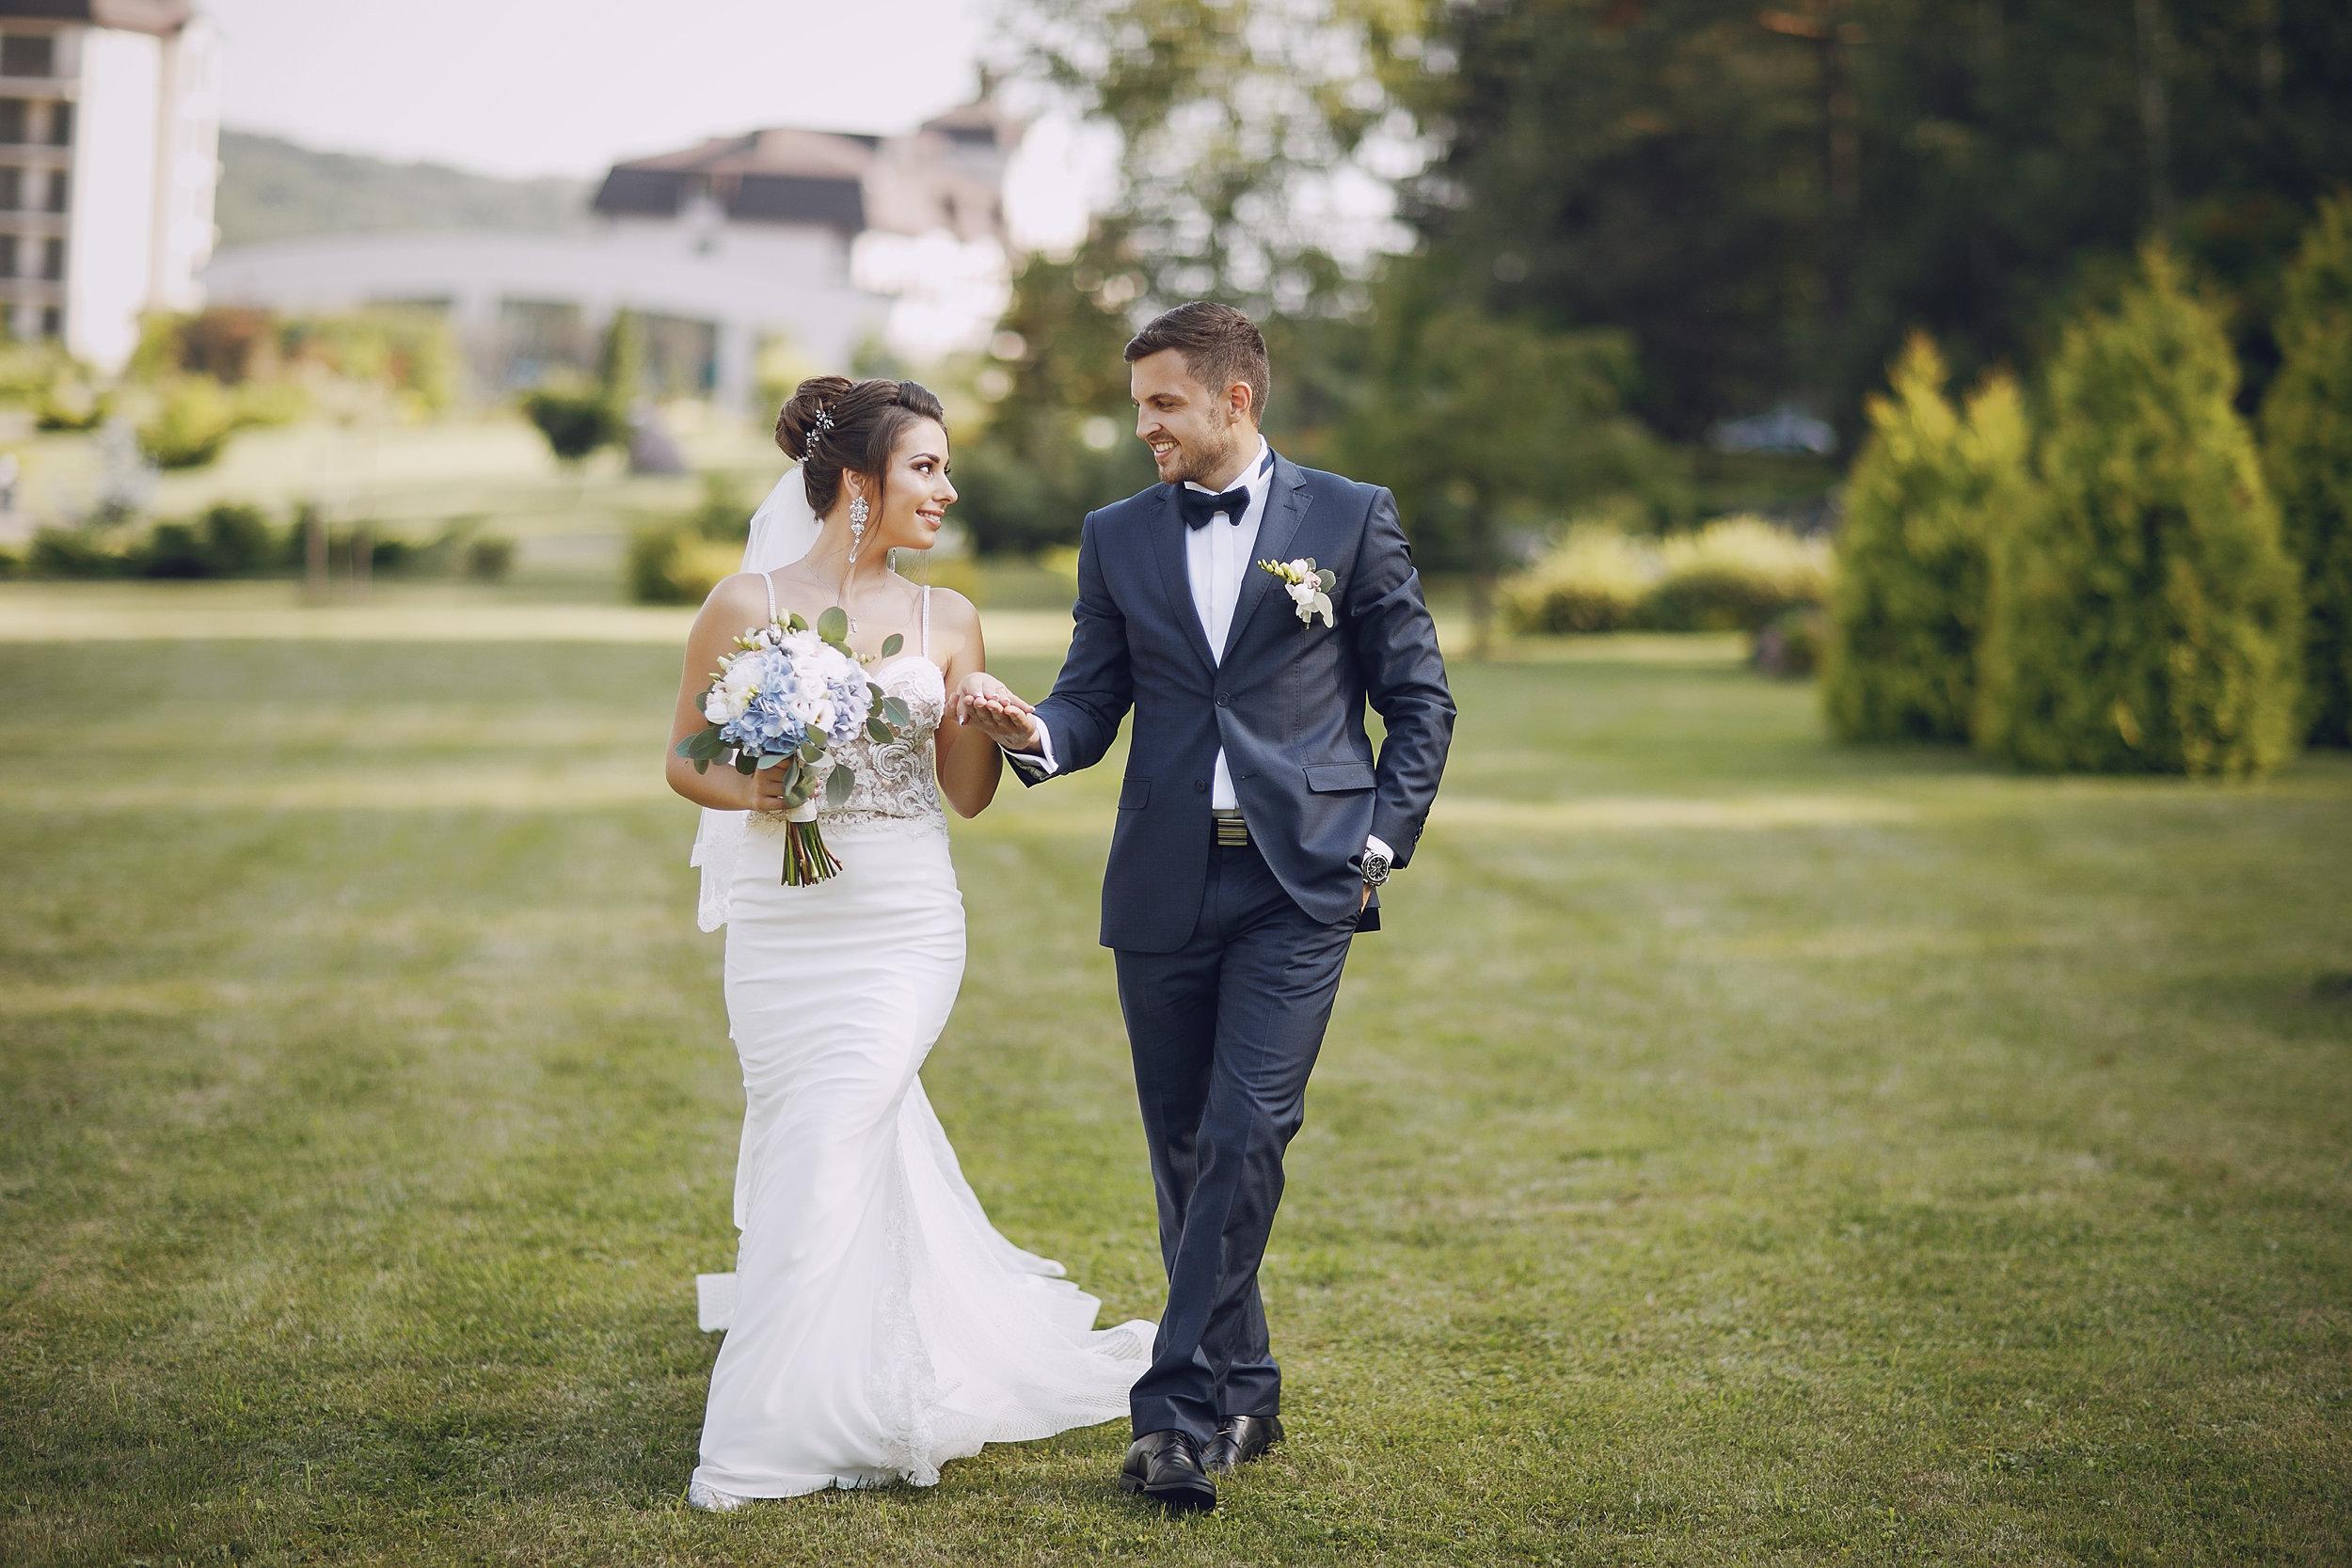 wedding-couple-47GZVTW.jpg